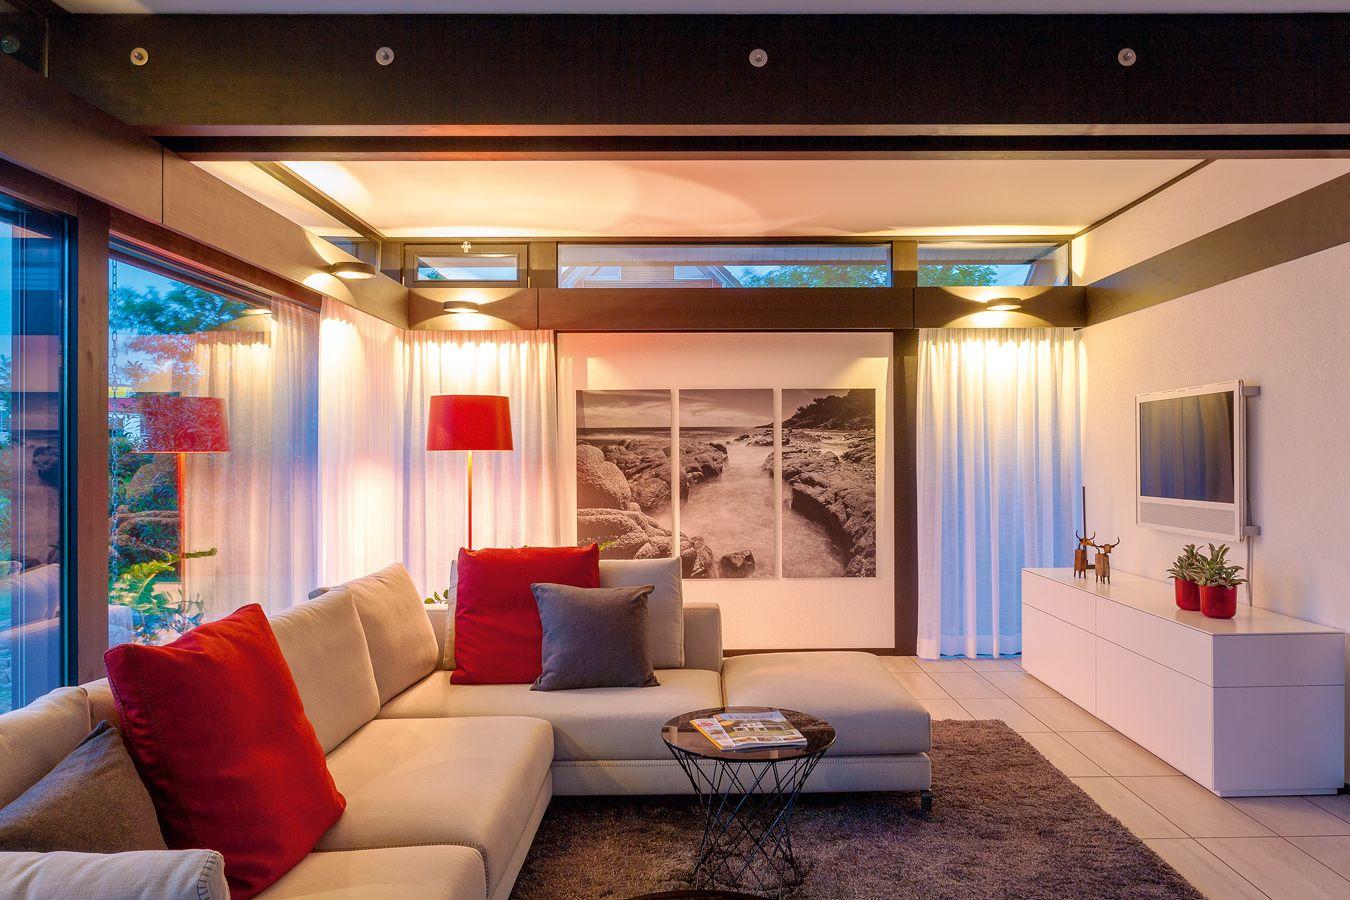 Musterhaus inneneinrichtung wohnzimmer  Musterhaus - HUF HAUS Koblenz | Fertighaus | Pinterest ...